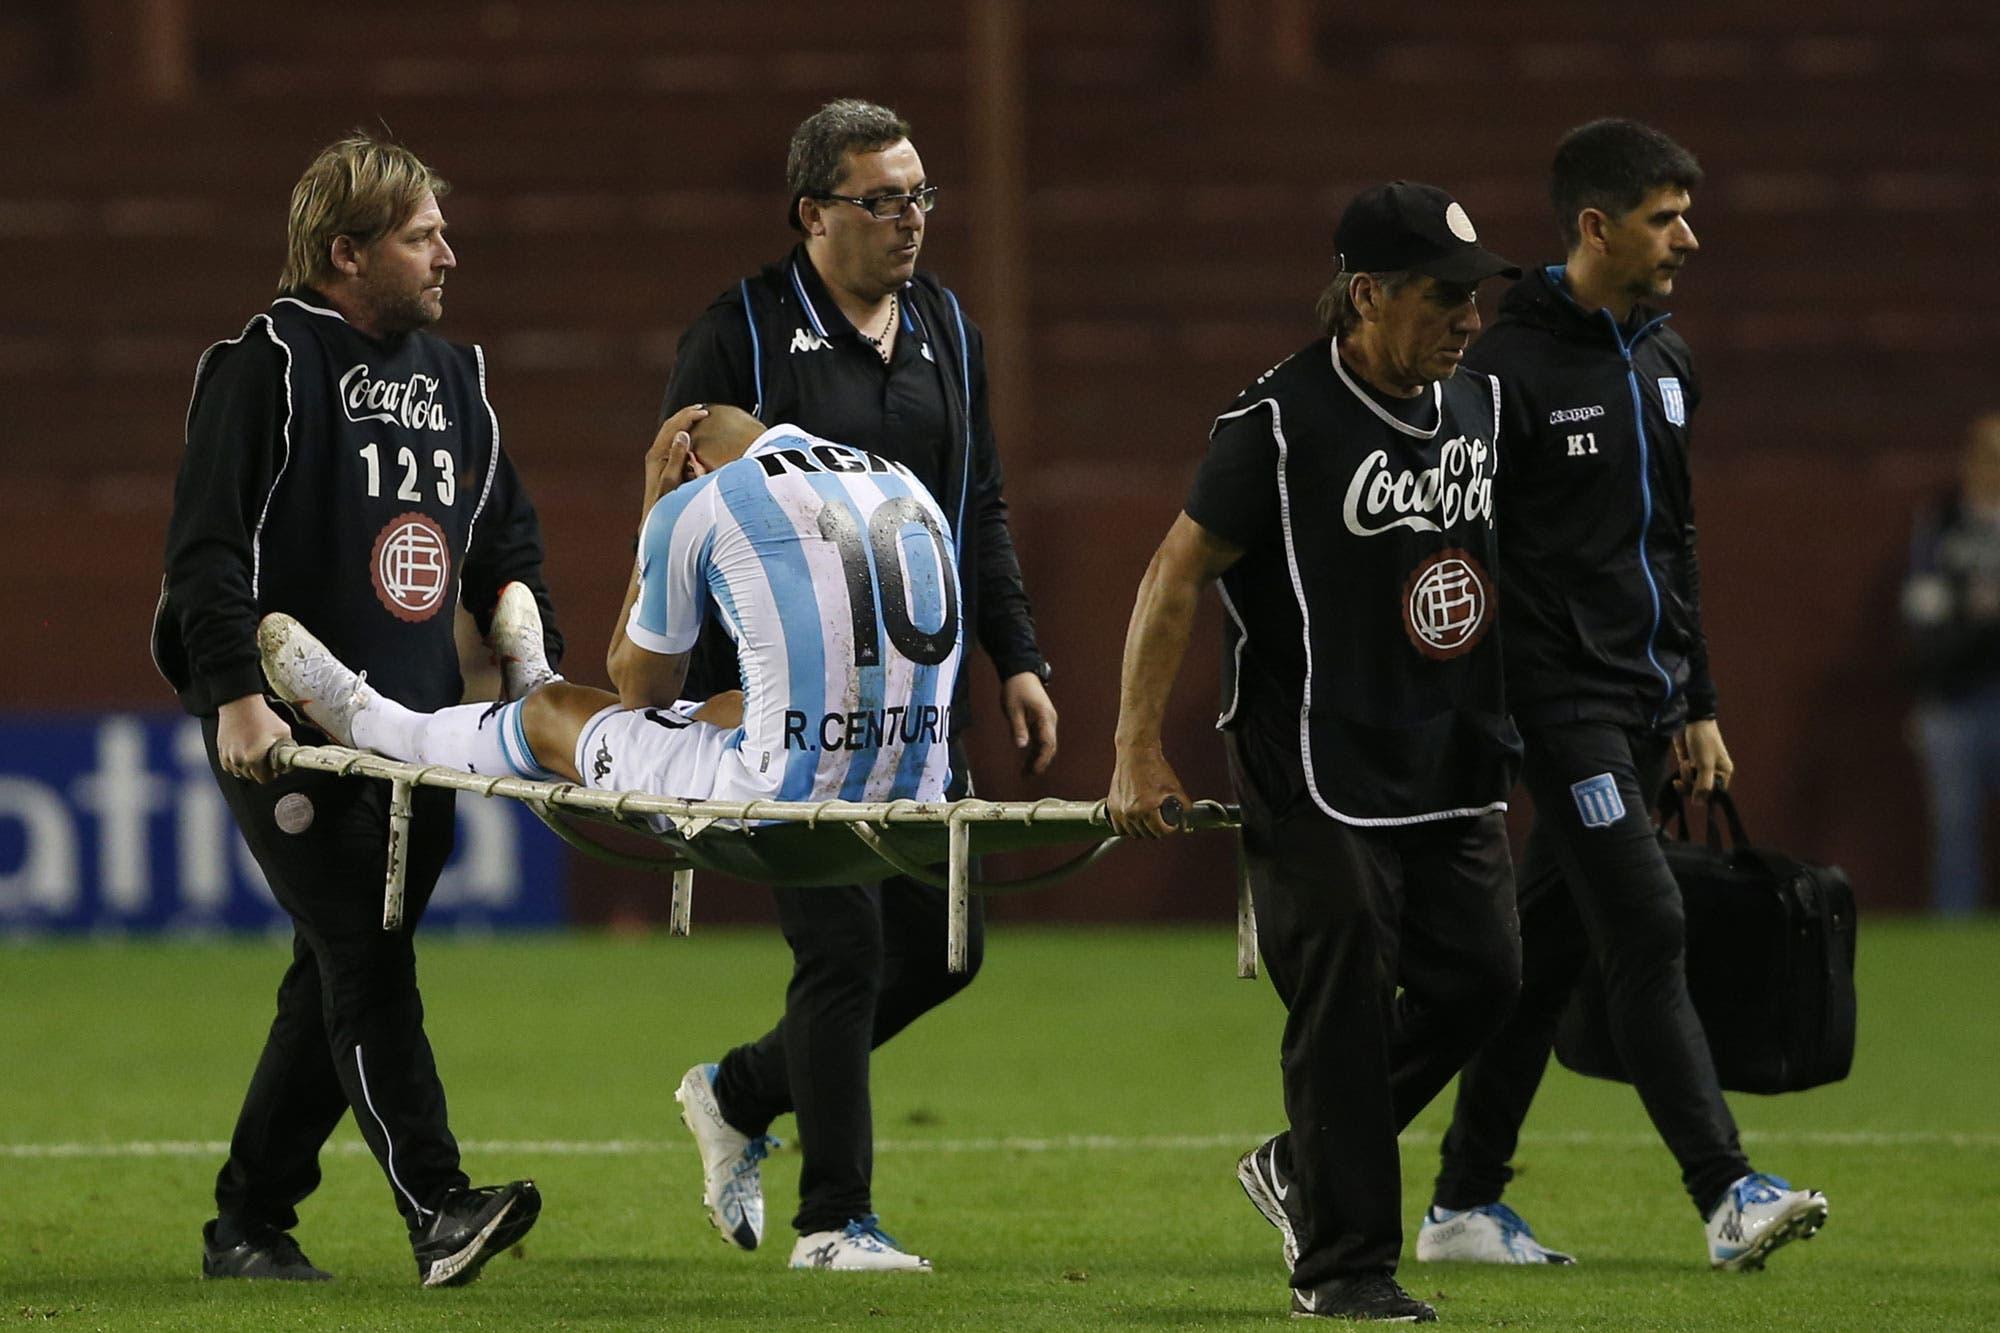 La mala racha persigue a Ricardo Centurión: solamente jugó seis minutos y se lesionó